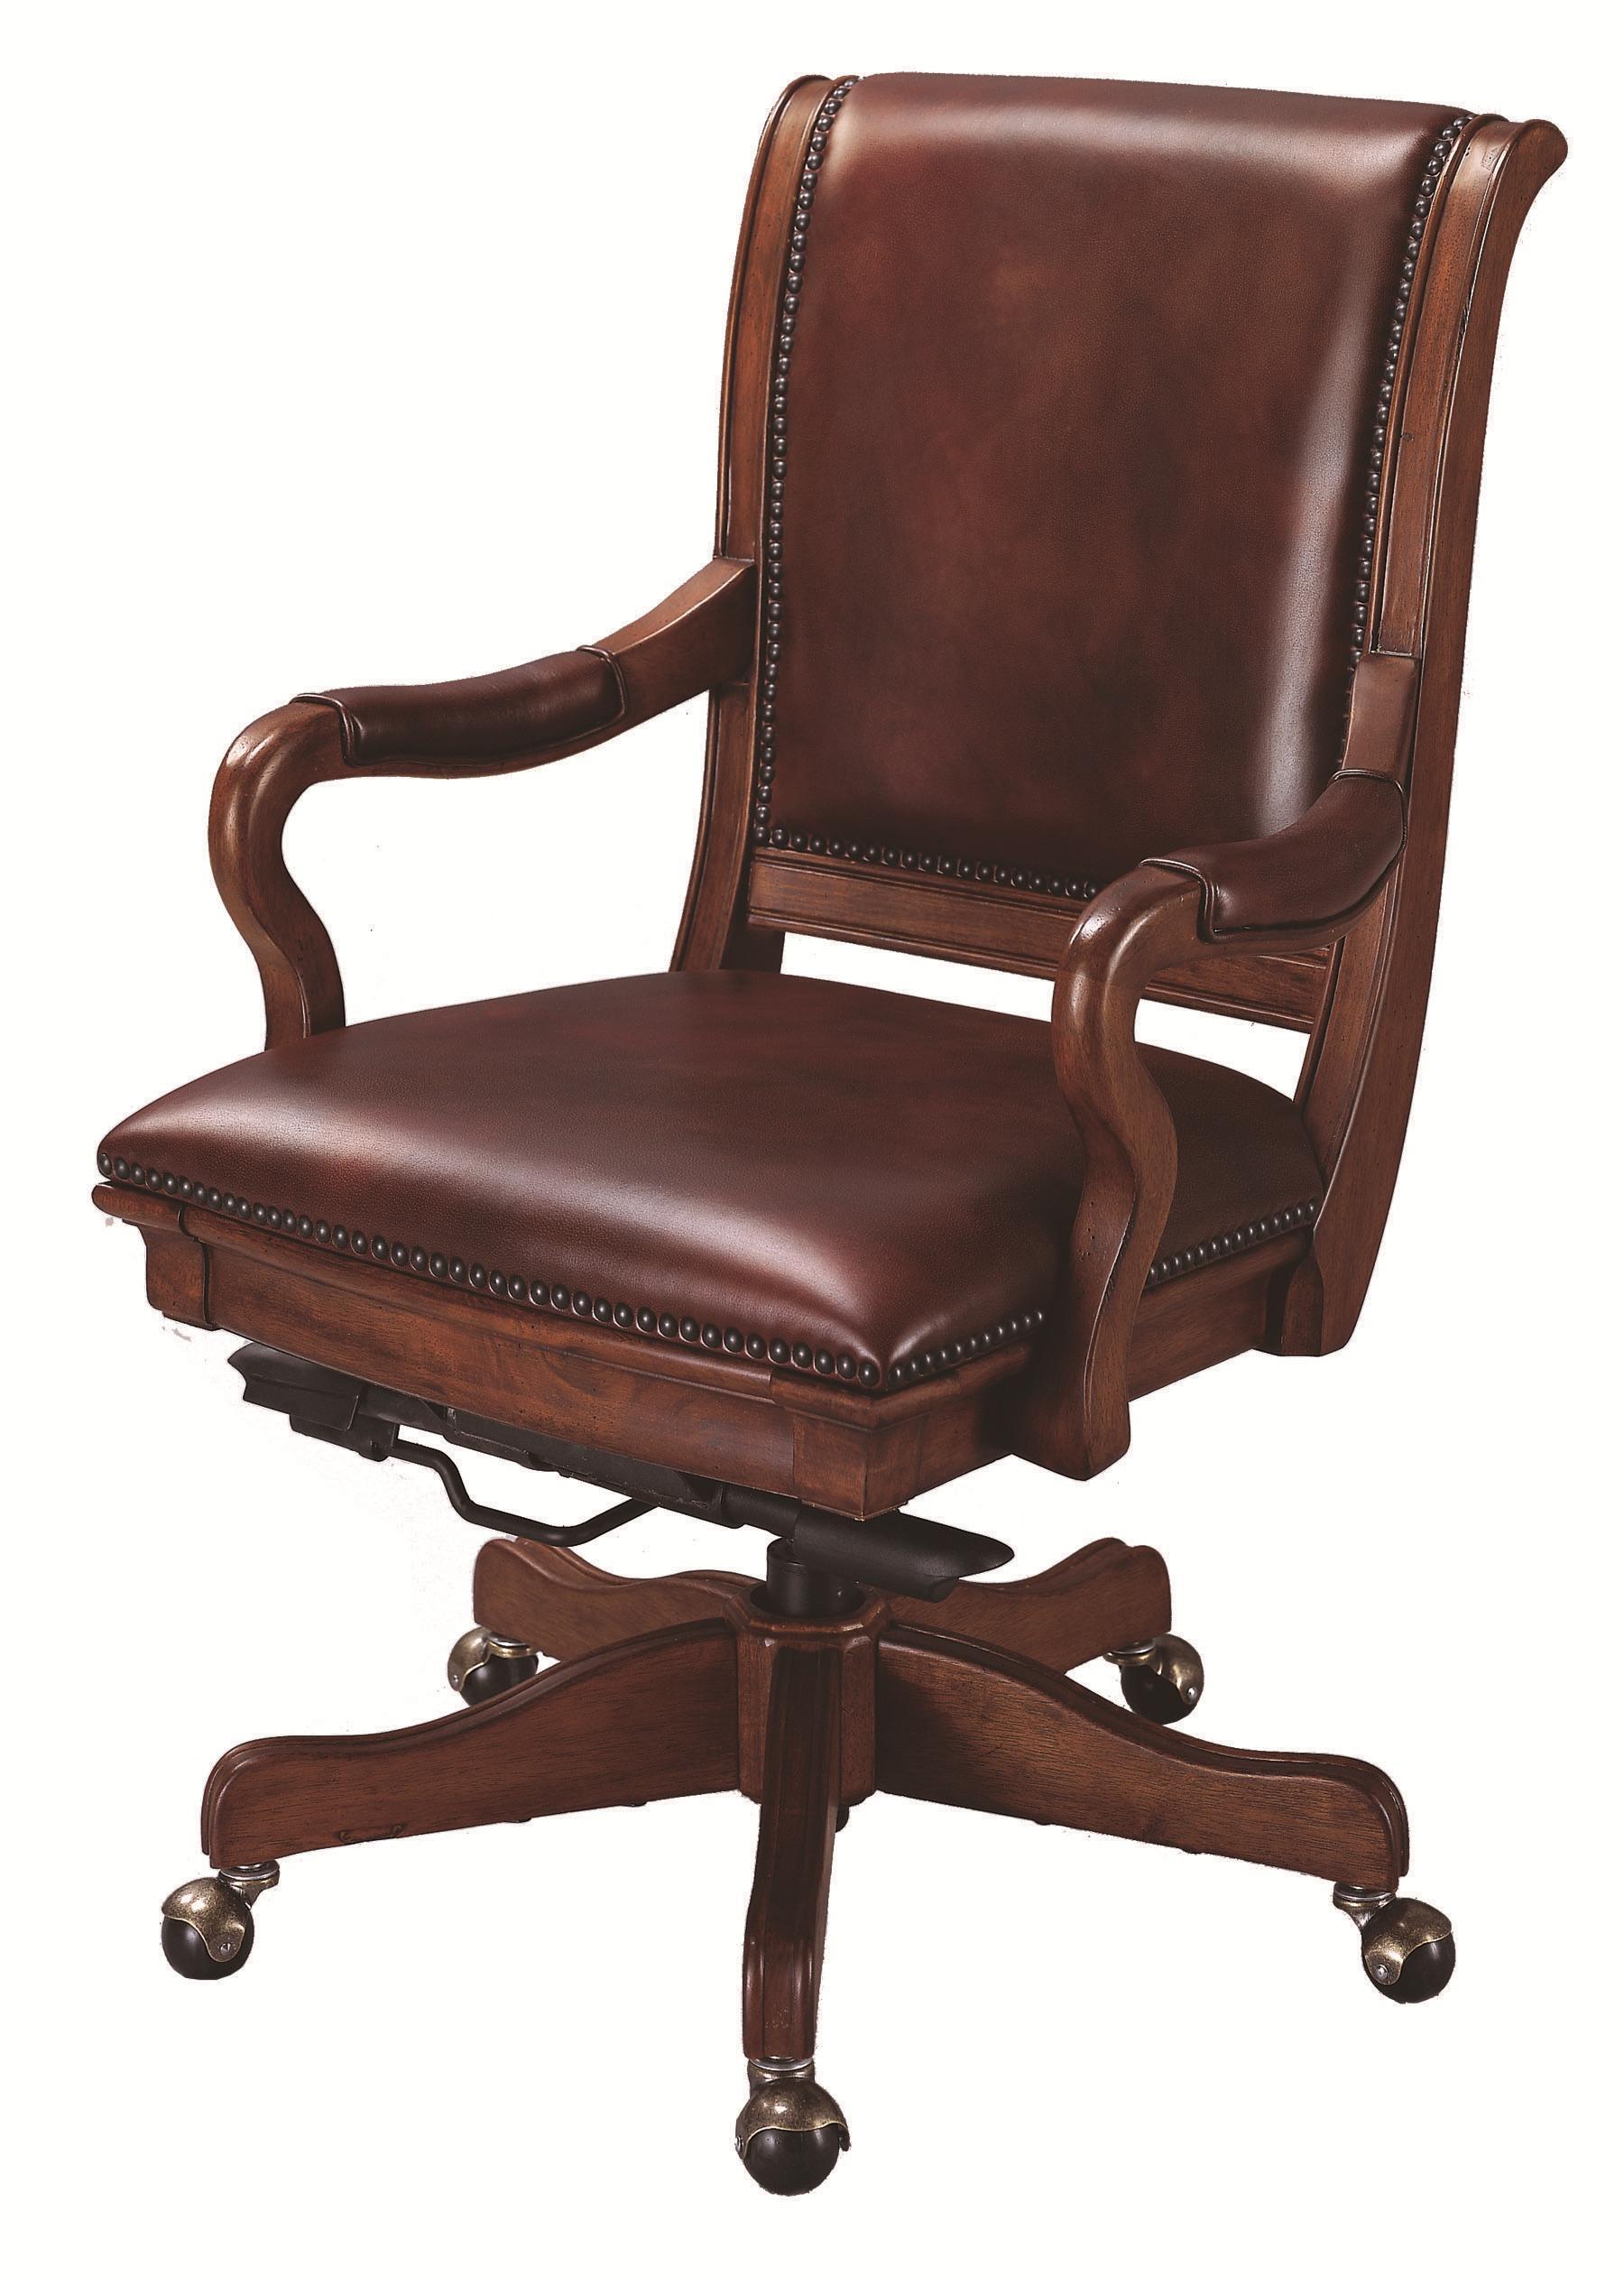 Aspenhome richmond l85 269963 leather upholstered caster for Hudsons furniture